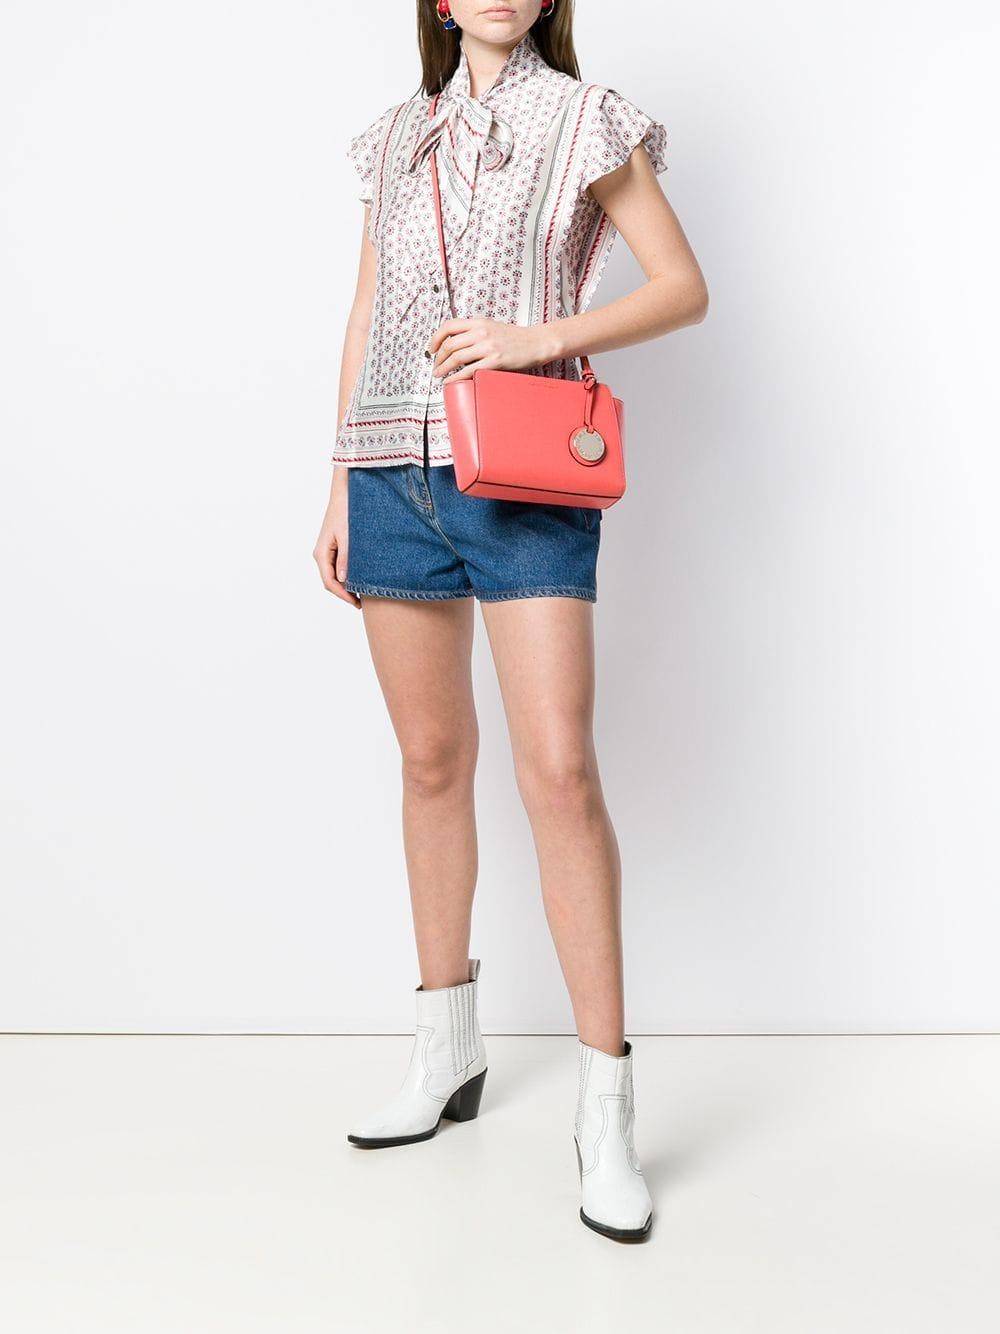 c8bb32ed9 Lyst - Emporio Armani Small Crossbody Bag in Pink - Save 8%